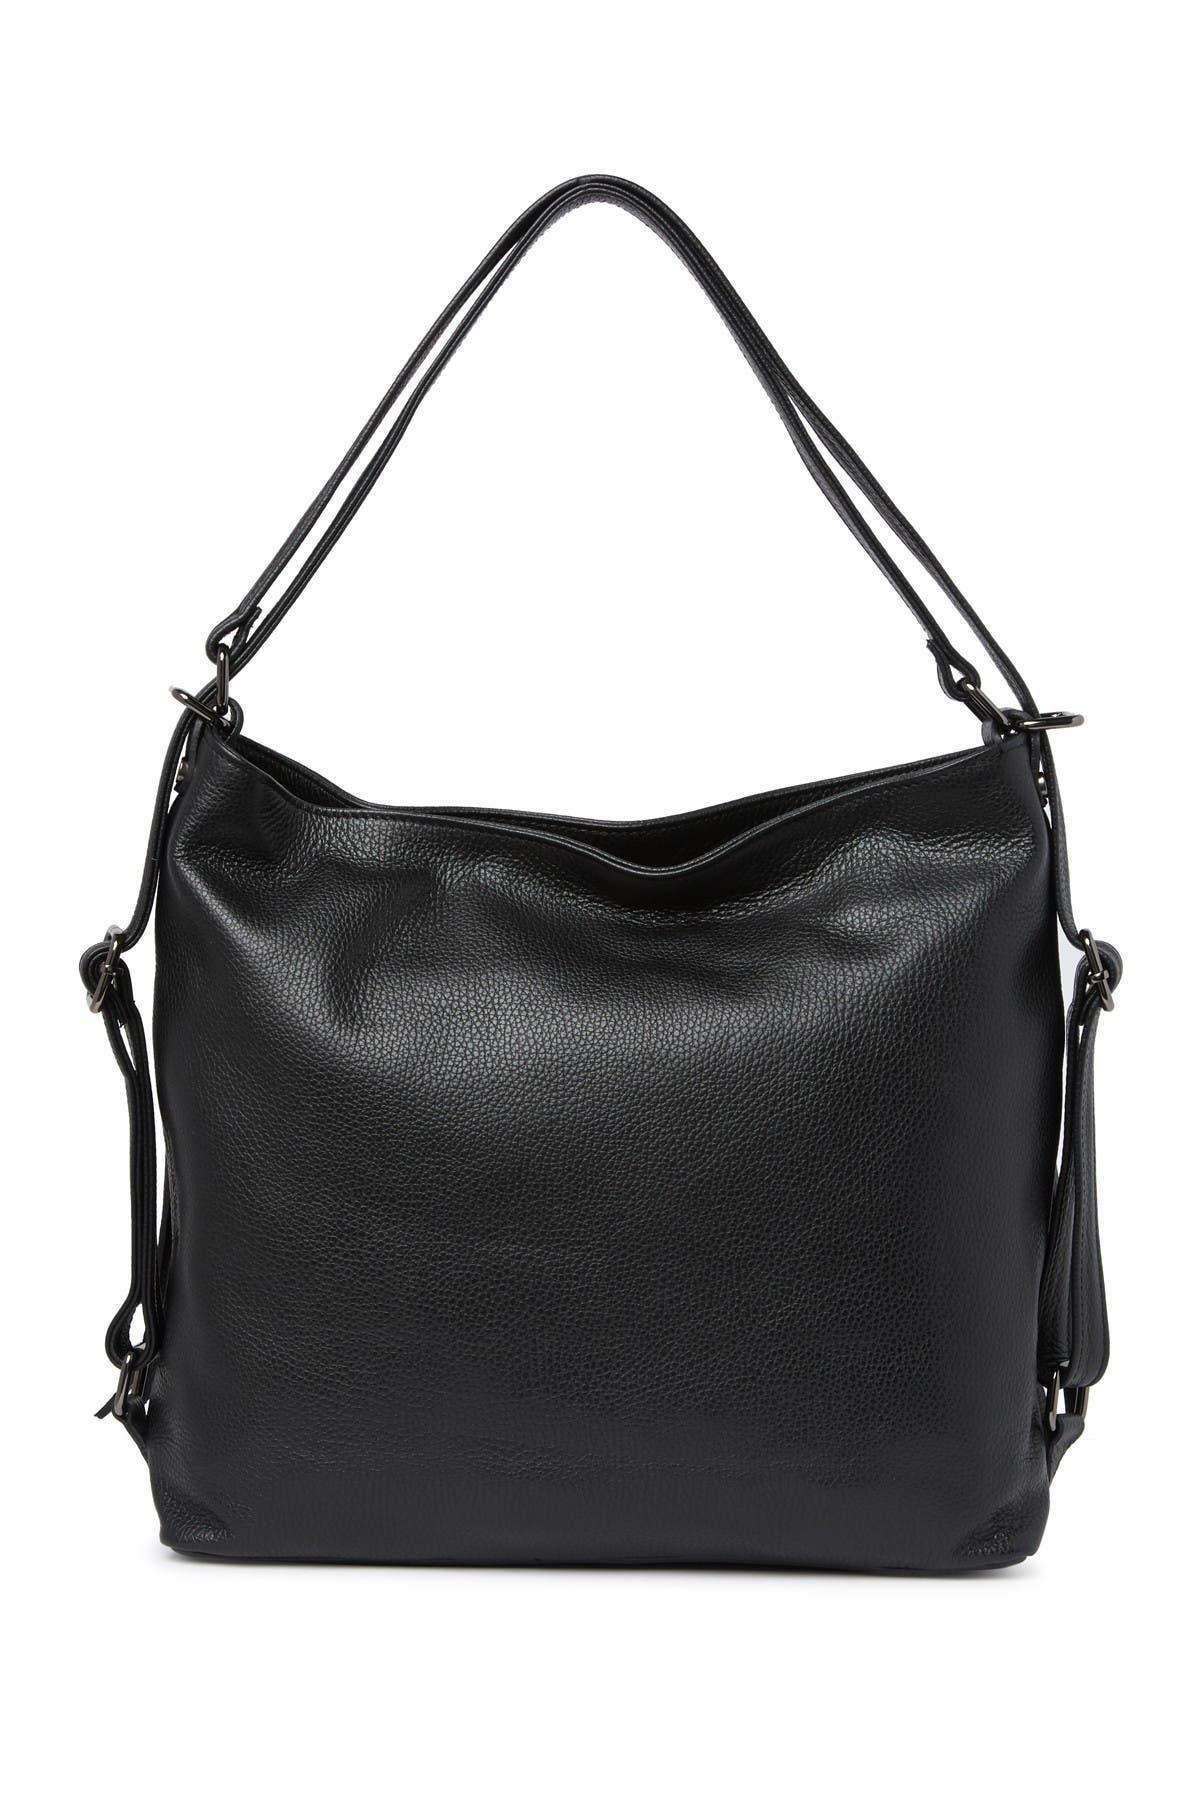 Image of Giulia Massari Leather Top Handle Shoulder Bag